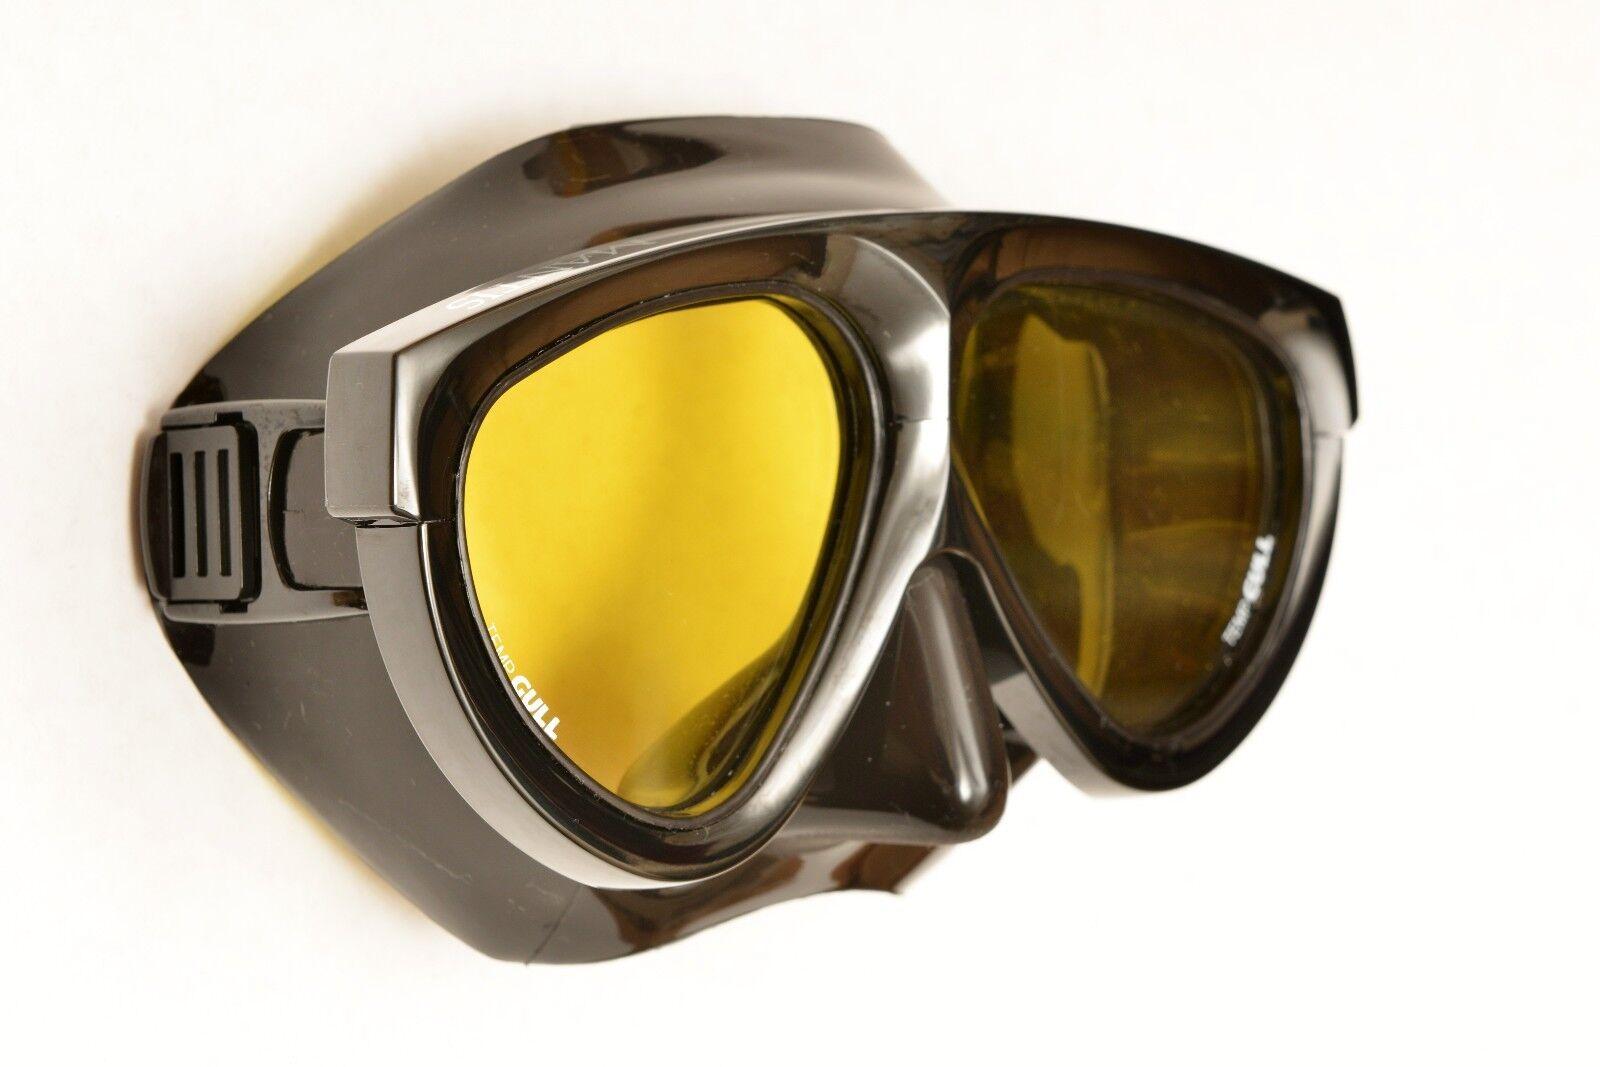 AQA GULL MANTIS Amber Scuba Dive Mask